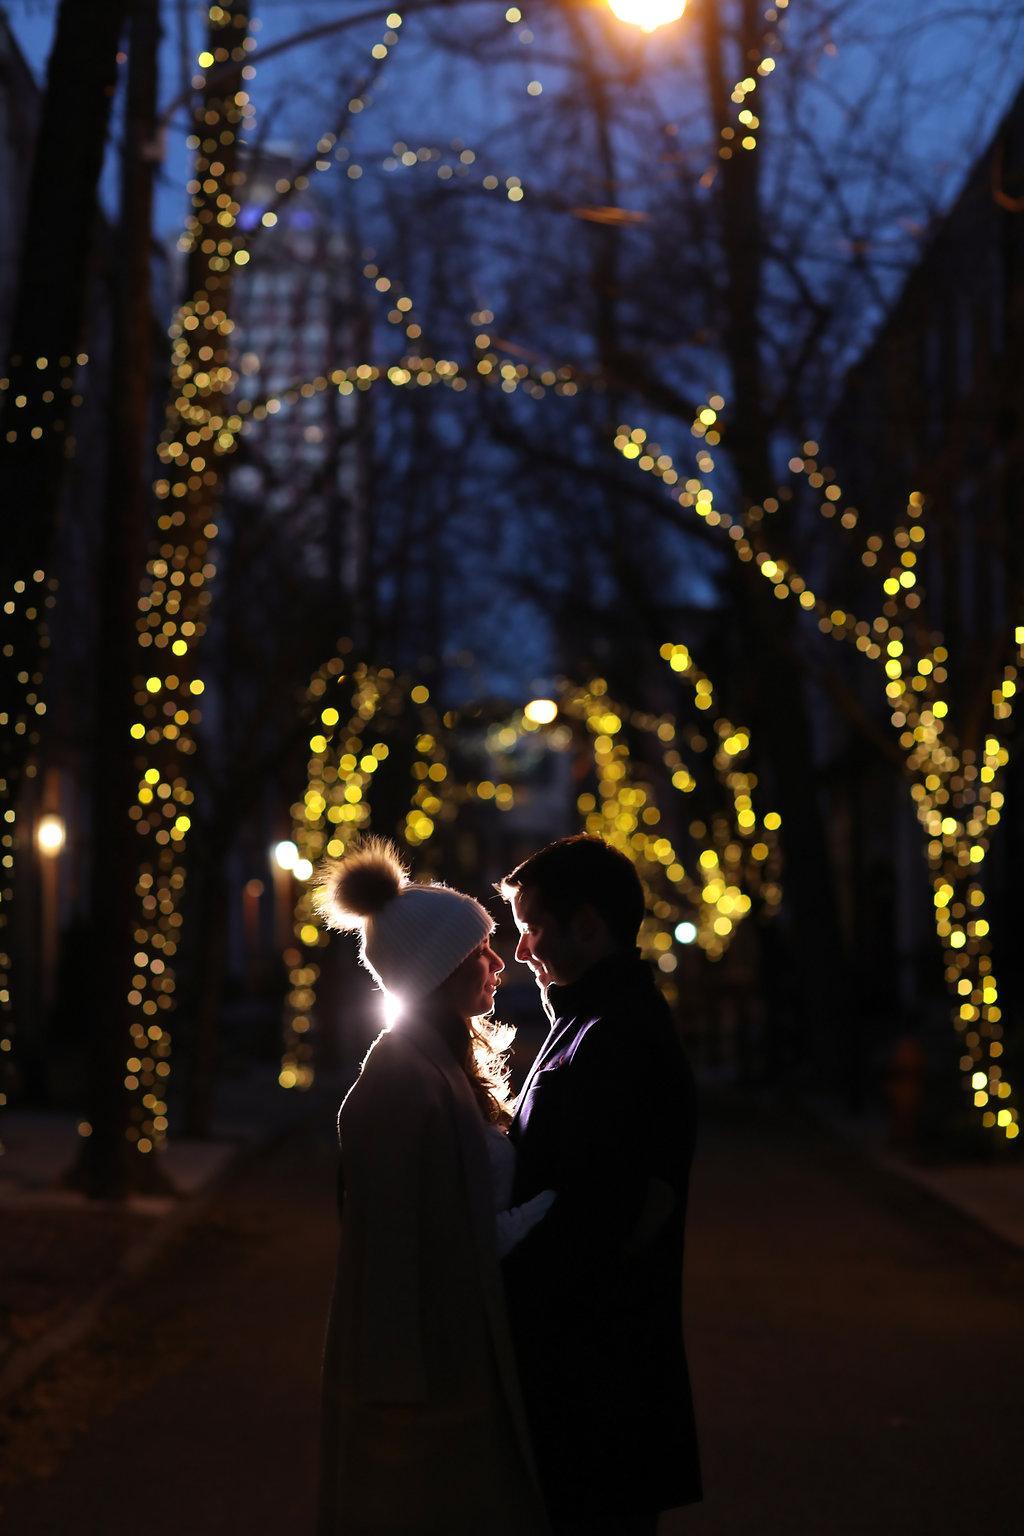 Festive Winter Engagement Session by Alison Conklin Photography Philadelphia Photographer Philly In Love Philadelphia Weddings